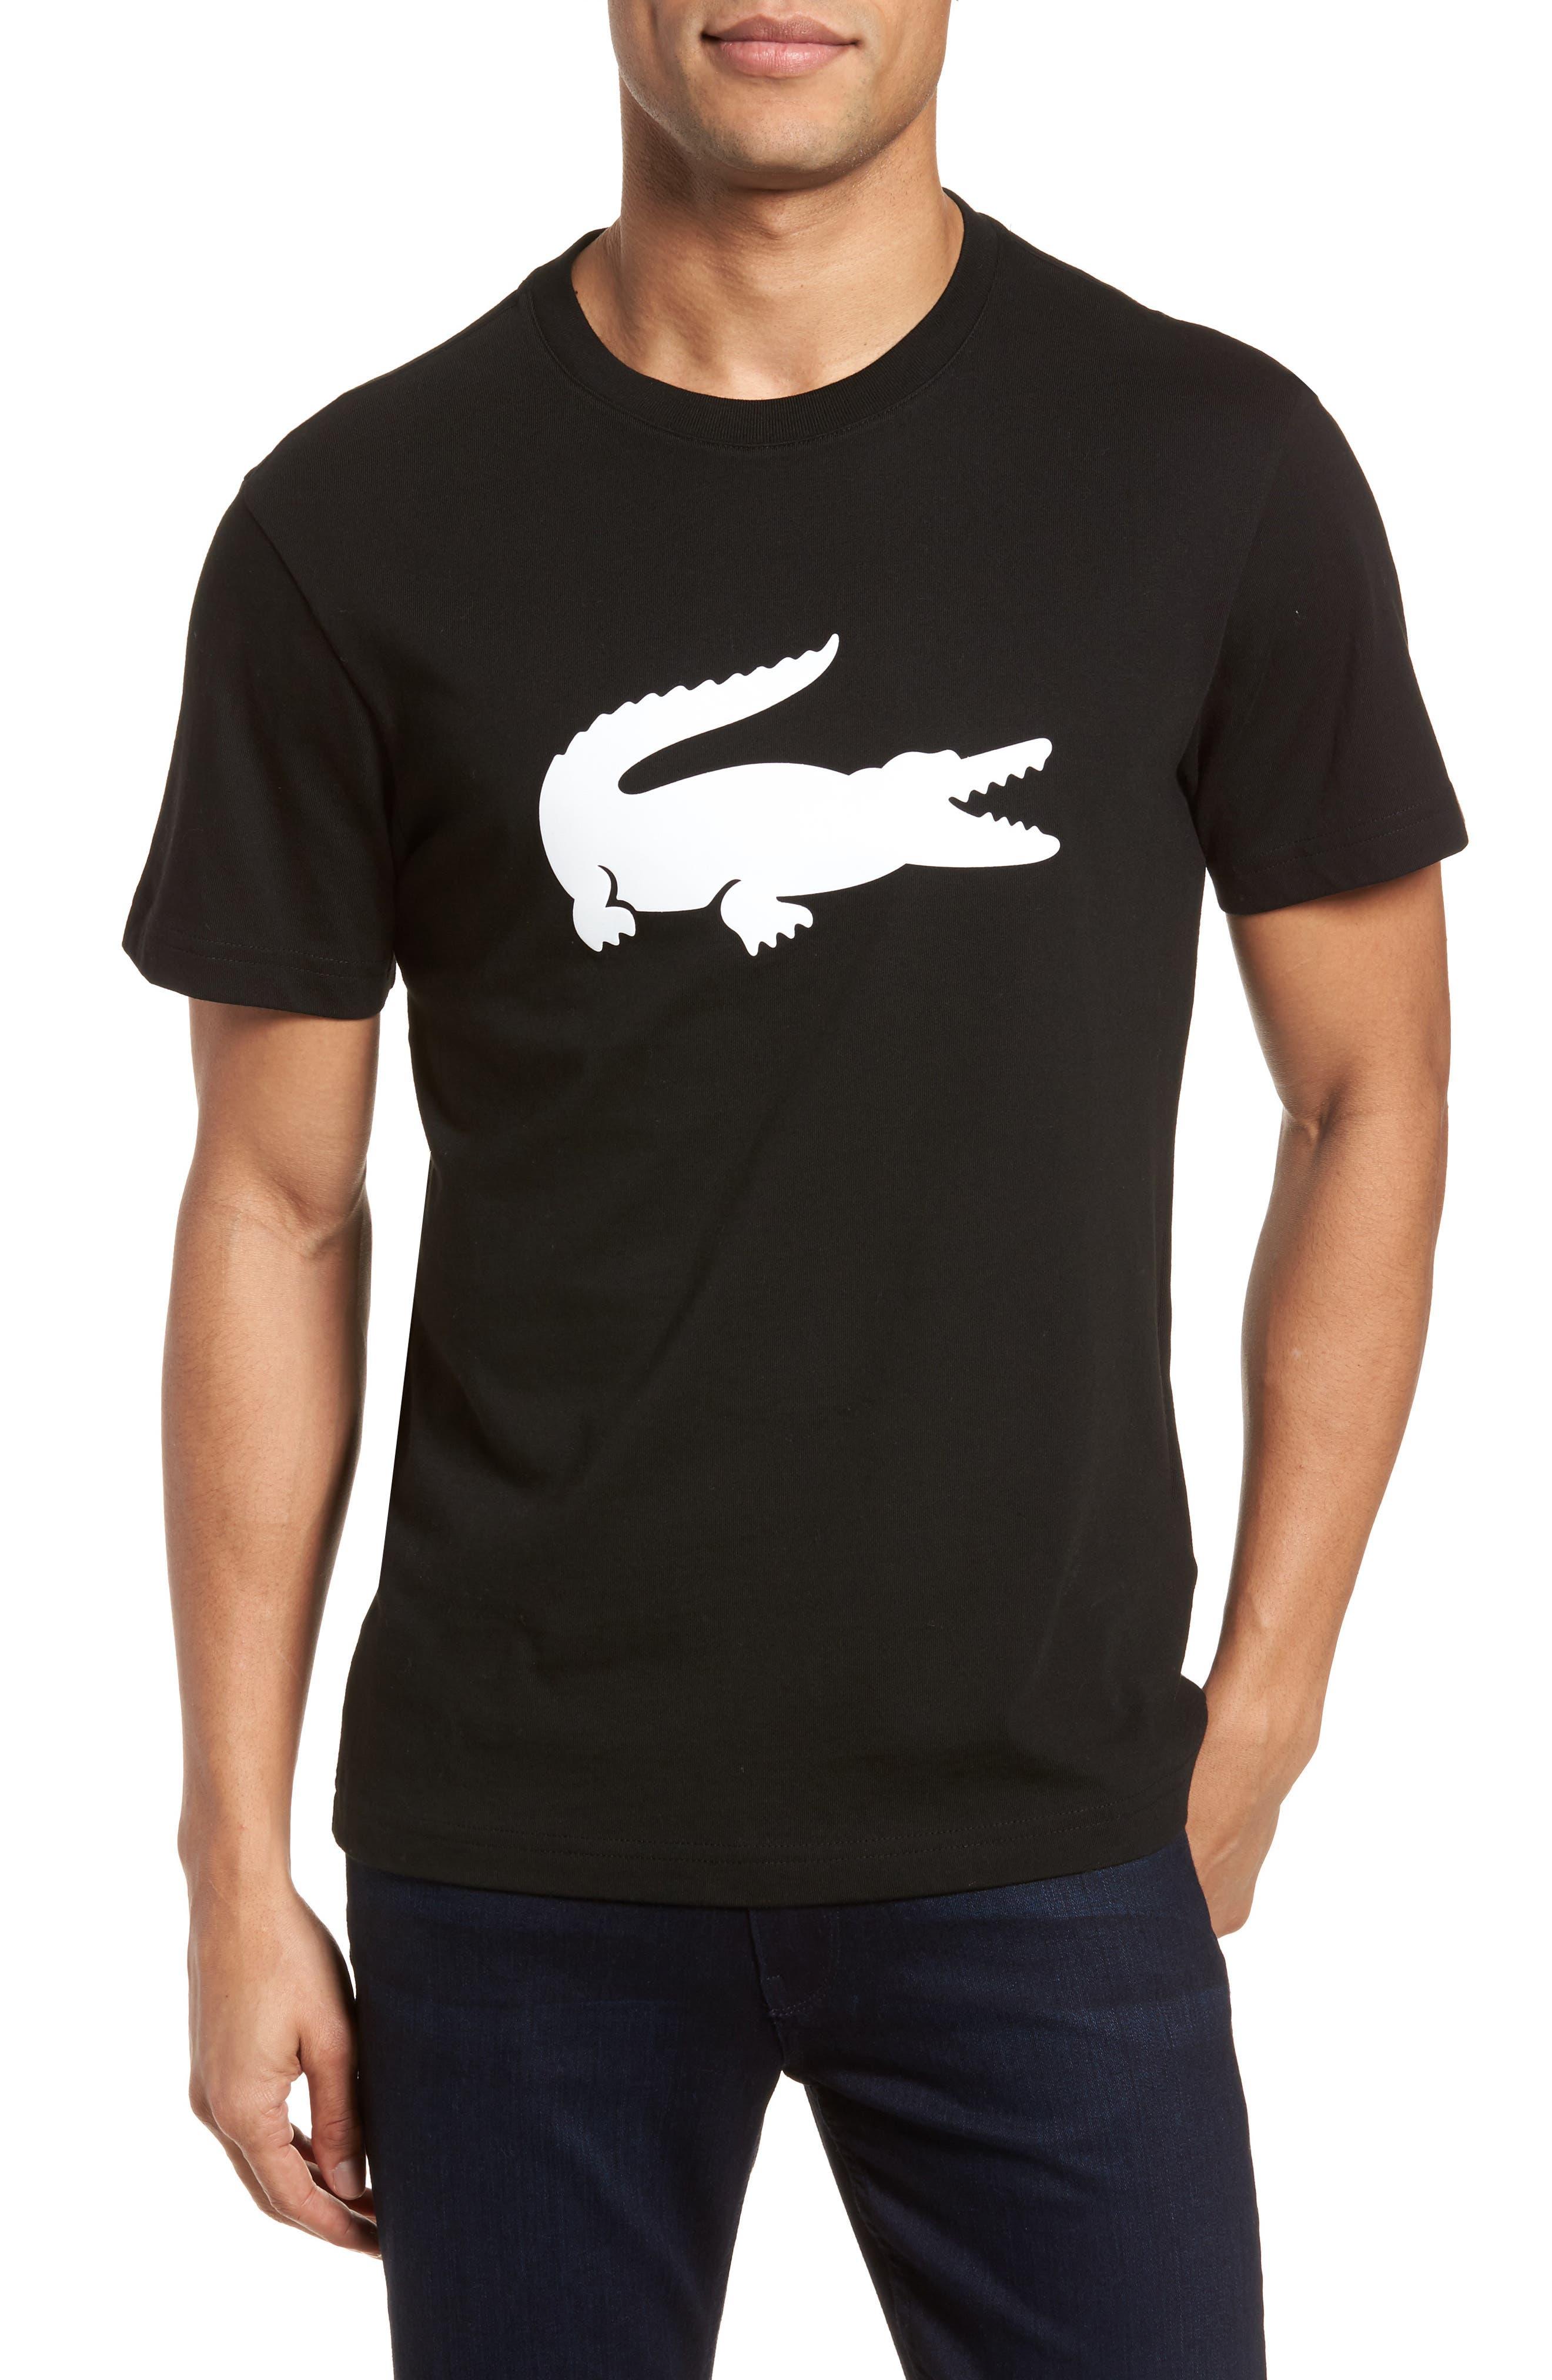 Crocodile T-Shirt,                         Main,                         color, 258 Black/ White